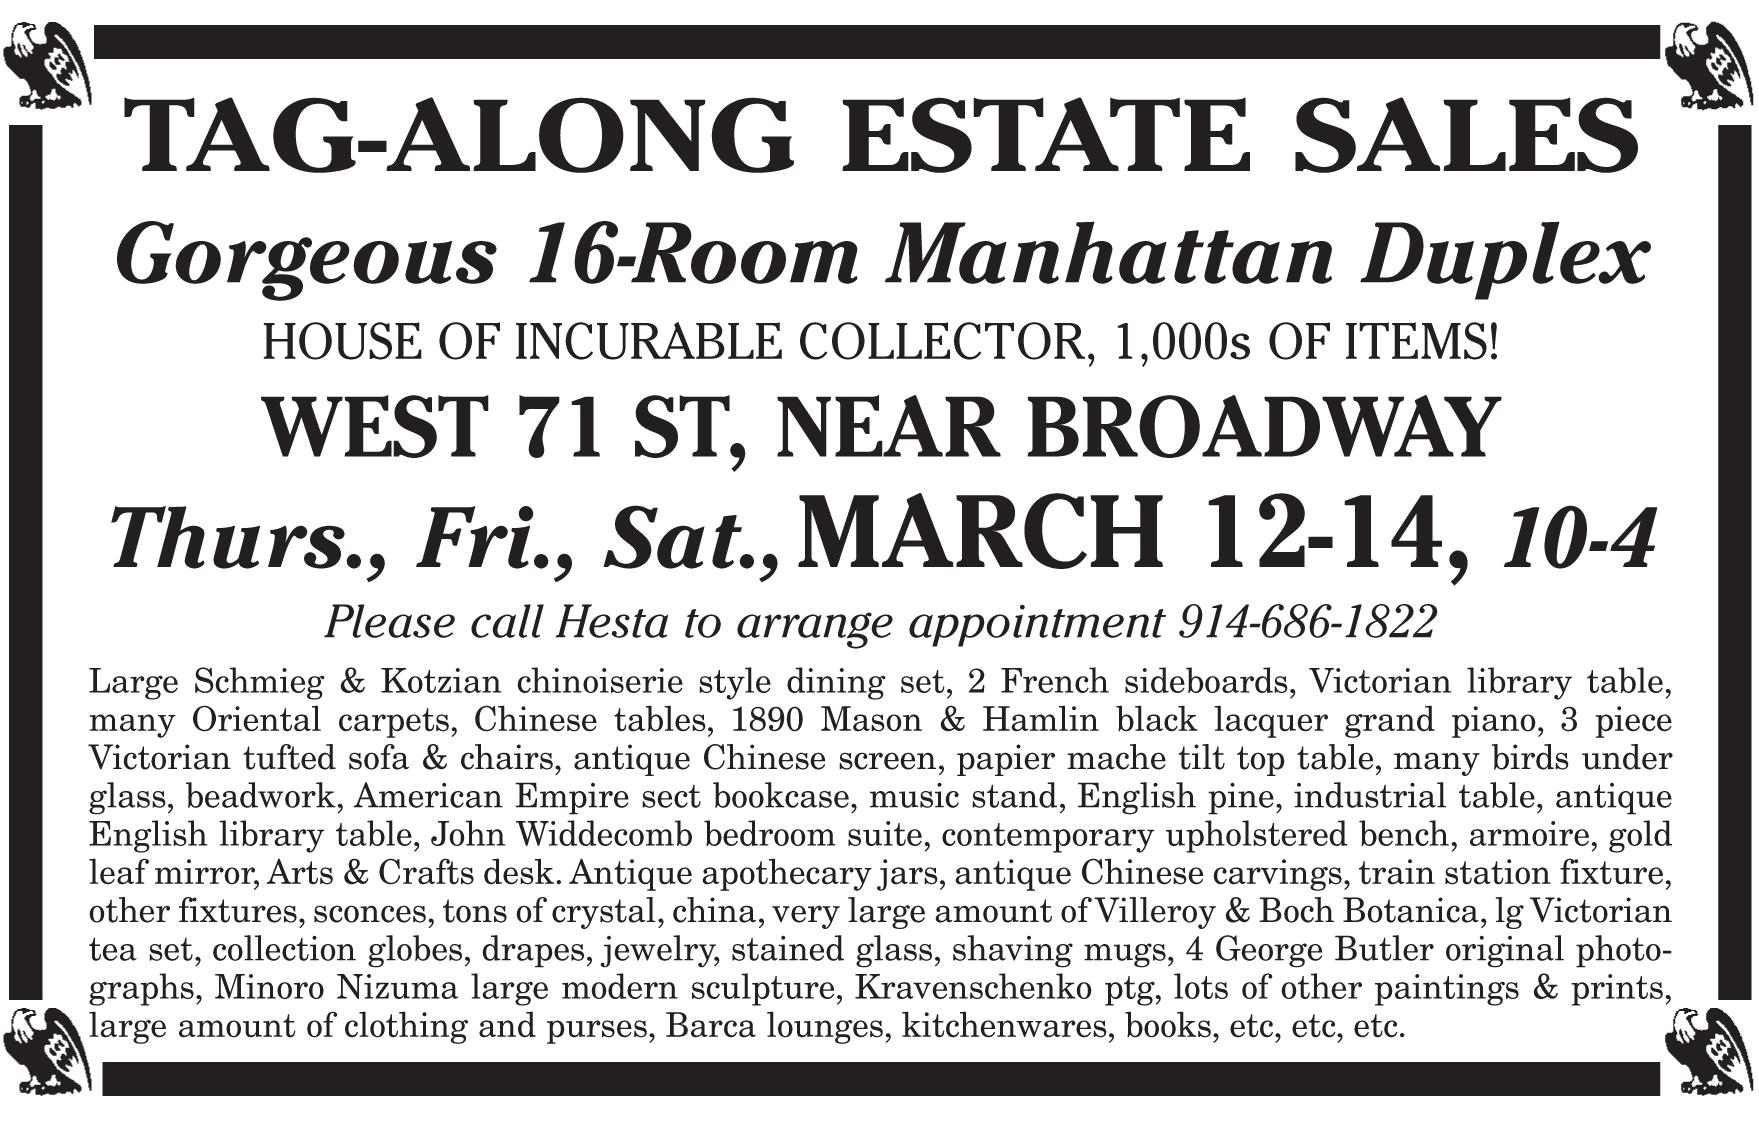 New York City Estate Sale by TAG-ALONG ESTATE SALES